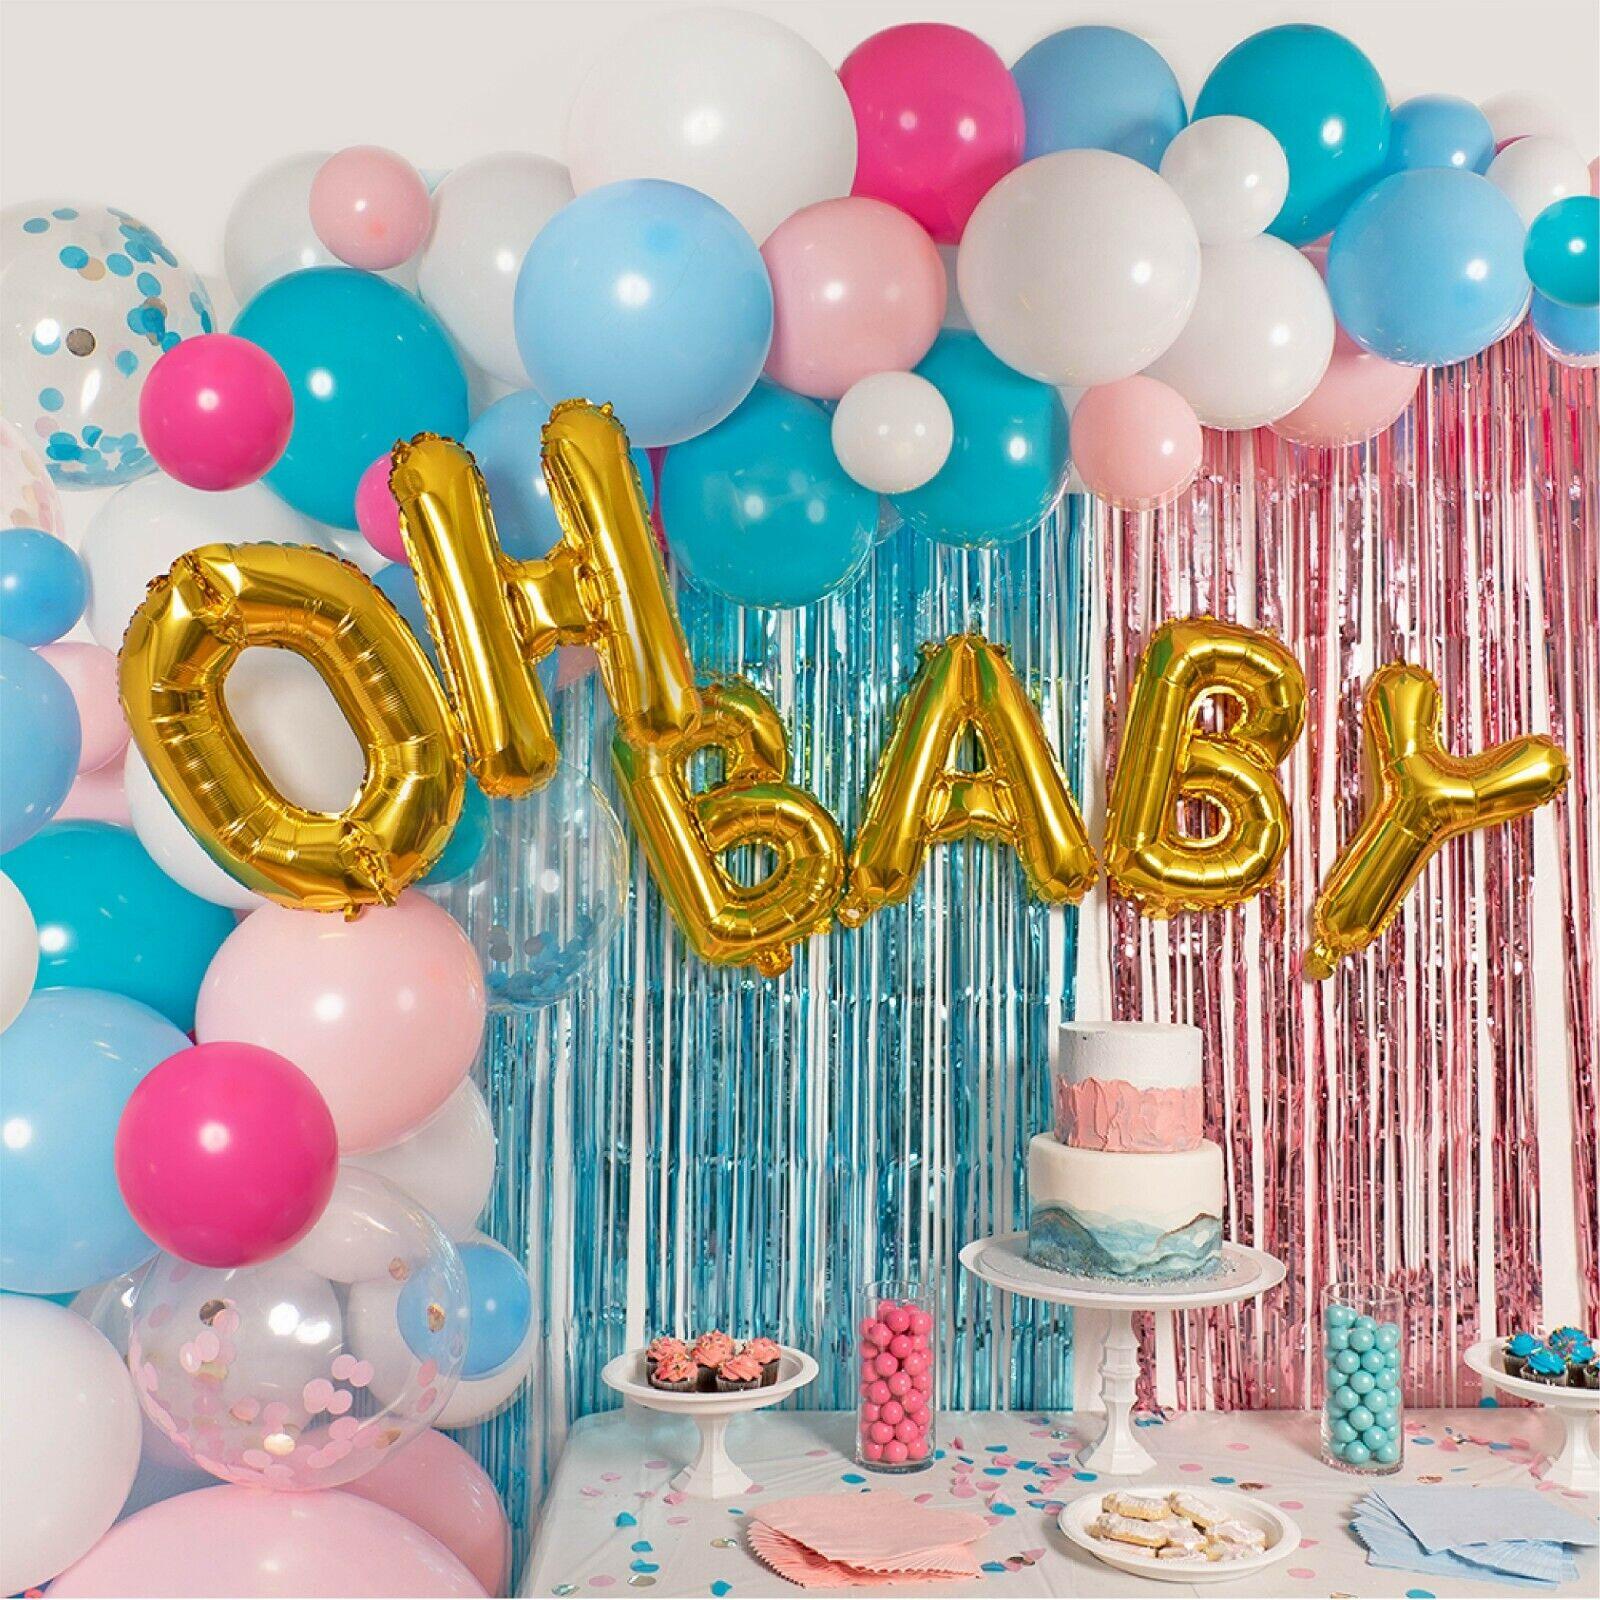 Gender Reveal Party Supplies Balloon Garland Kit - Tinsel Cu